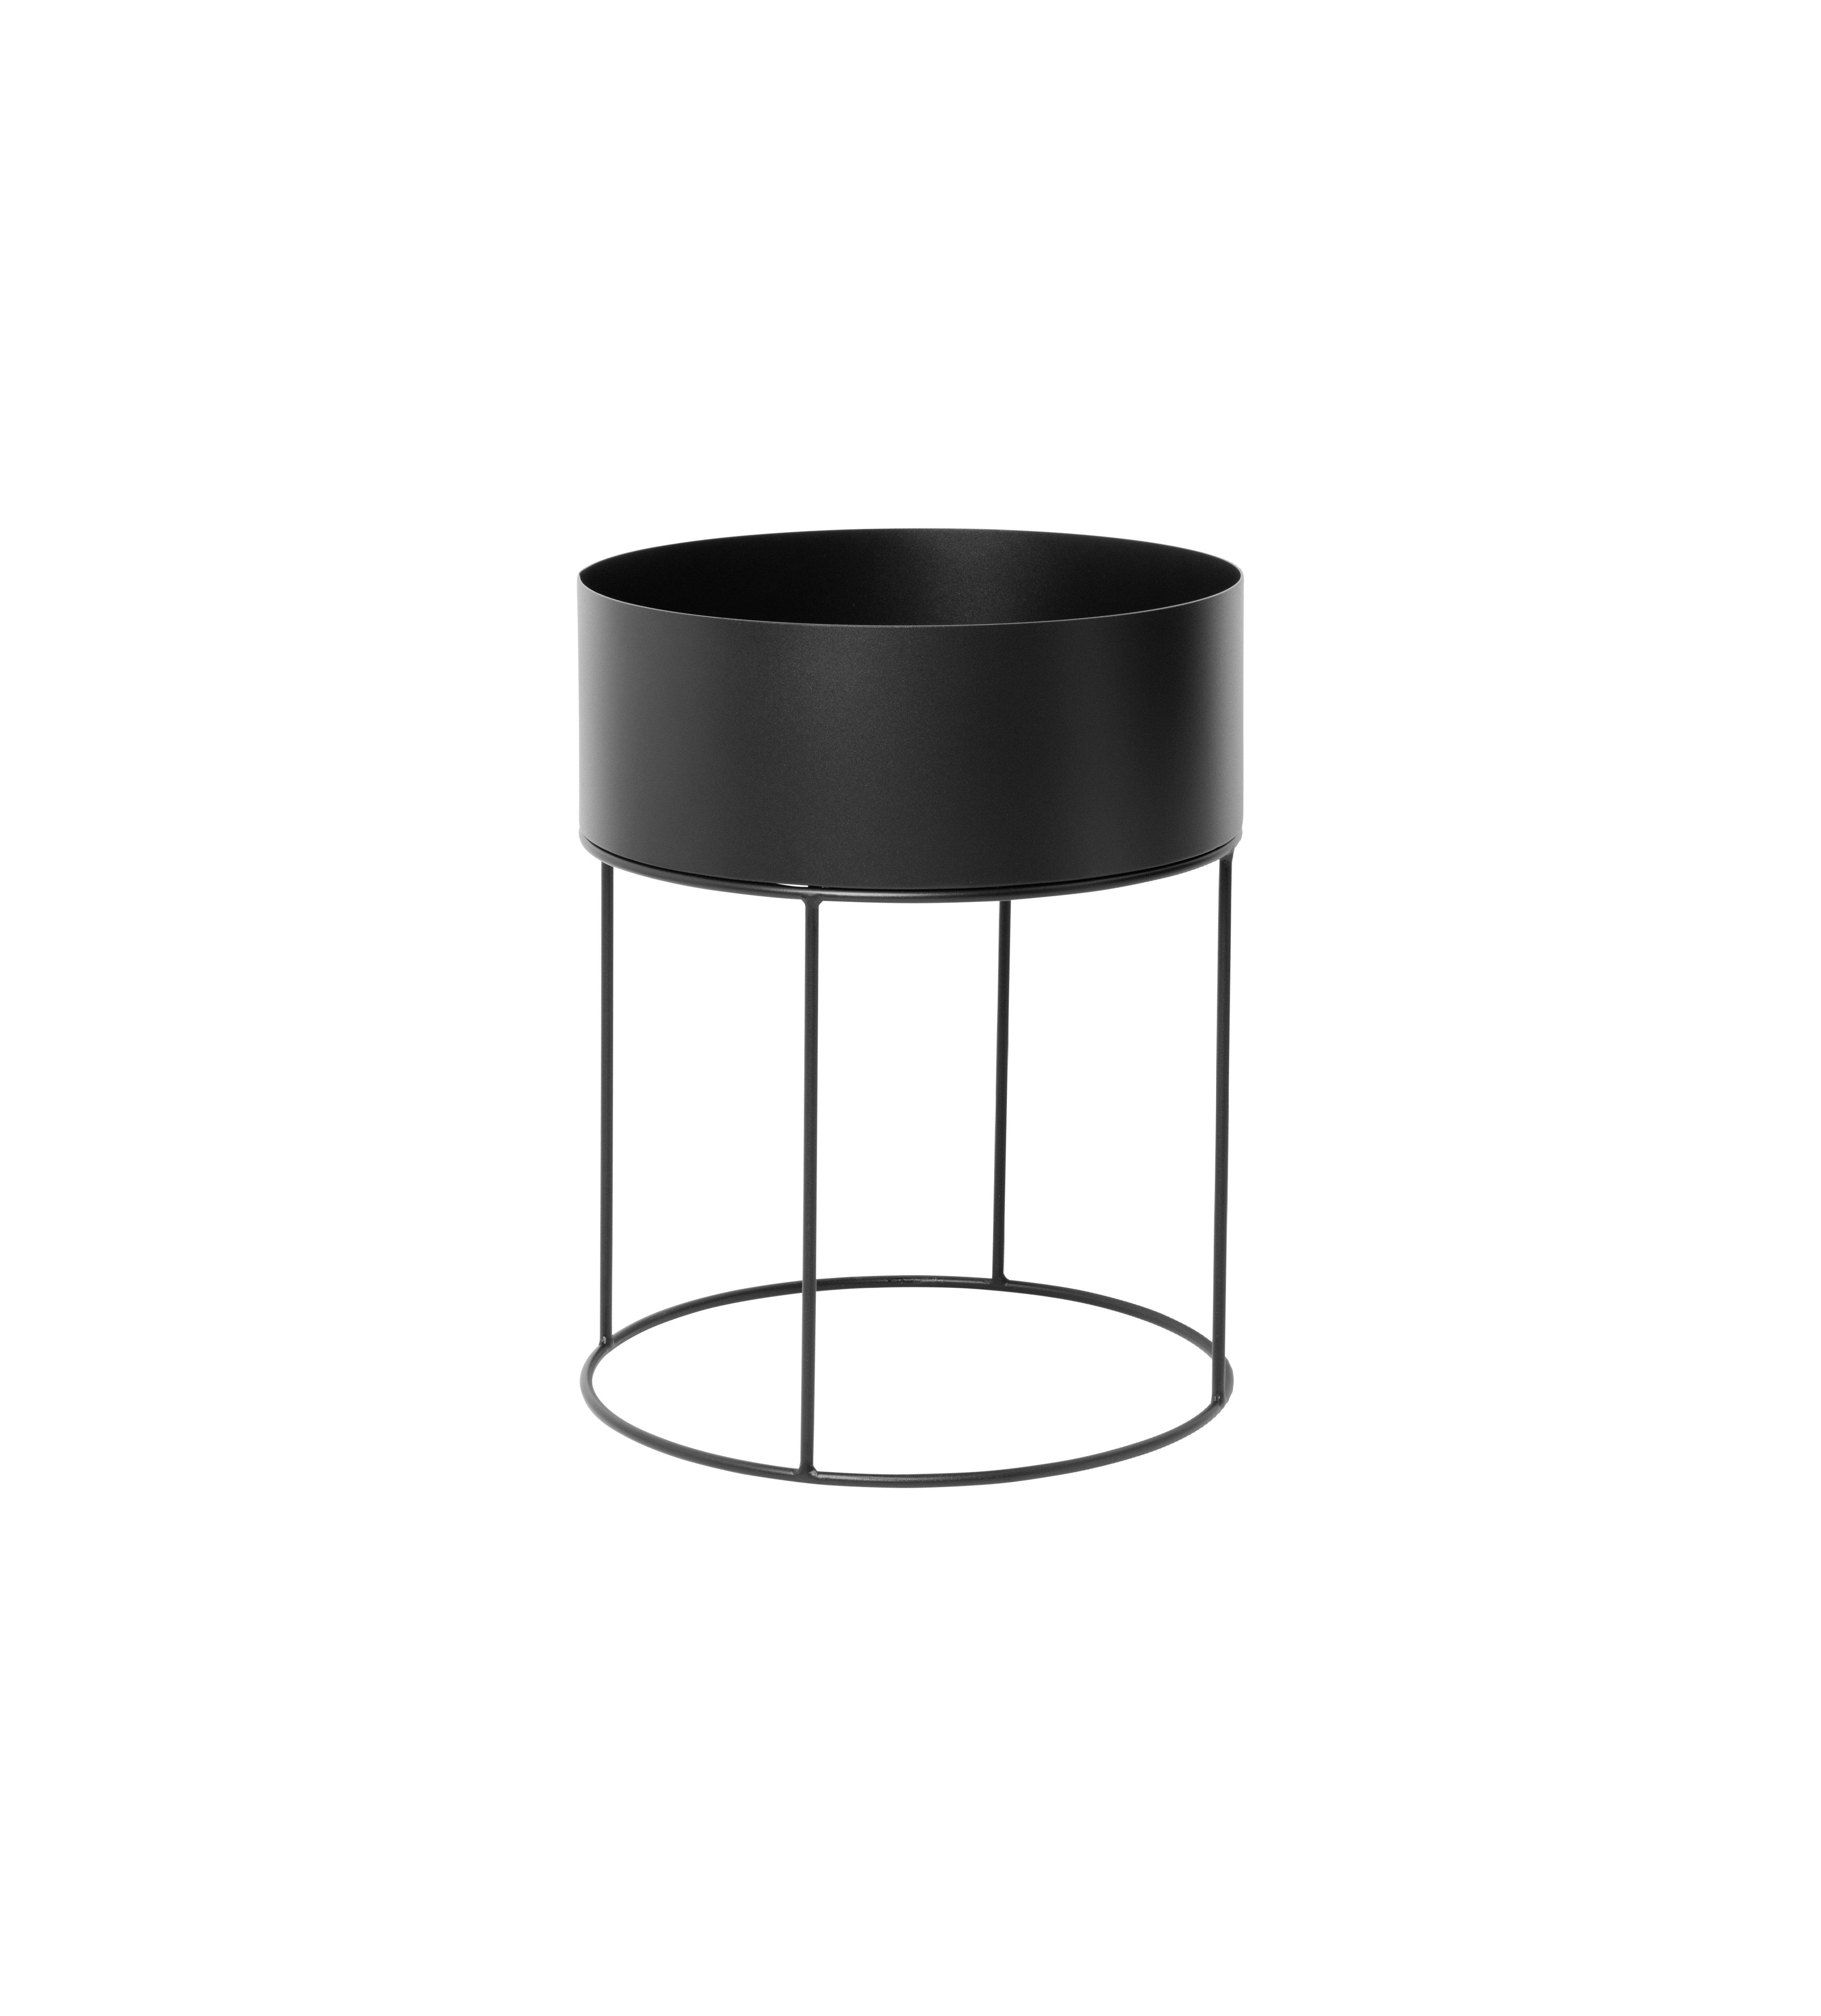 Ferm Living - Plant Box Round - Black (3356)